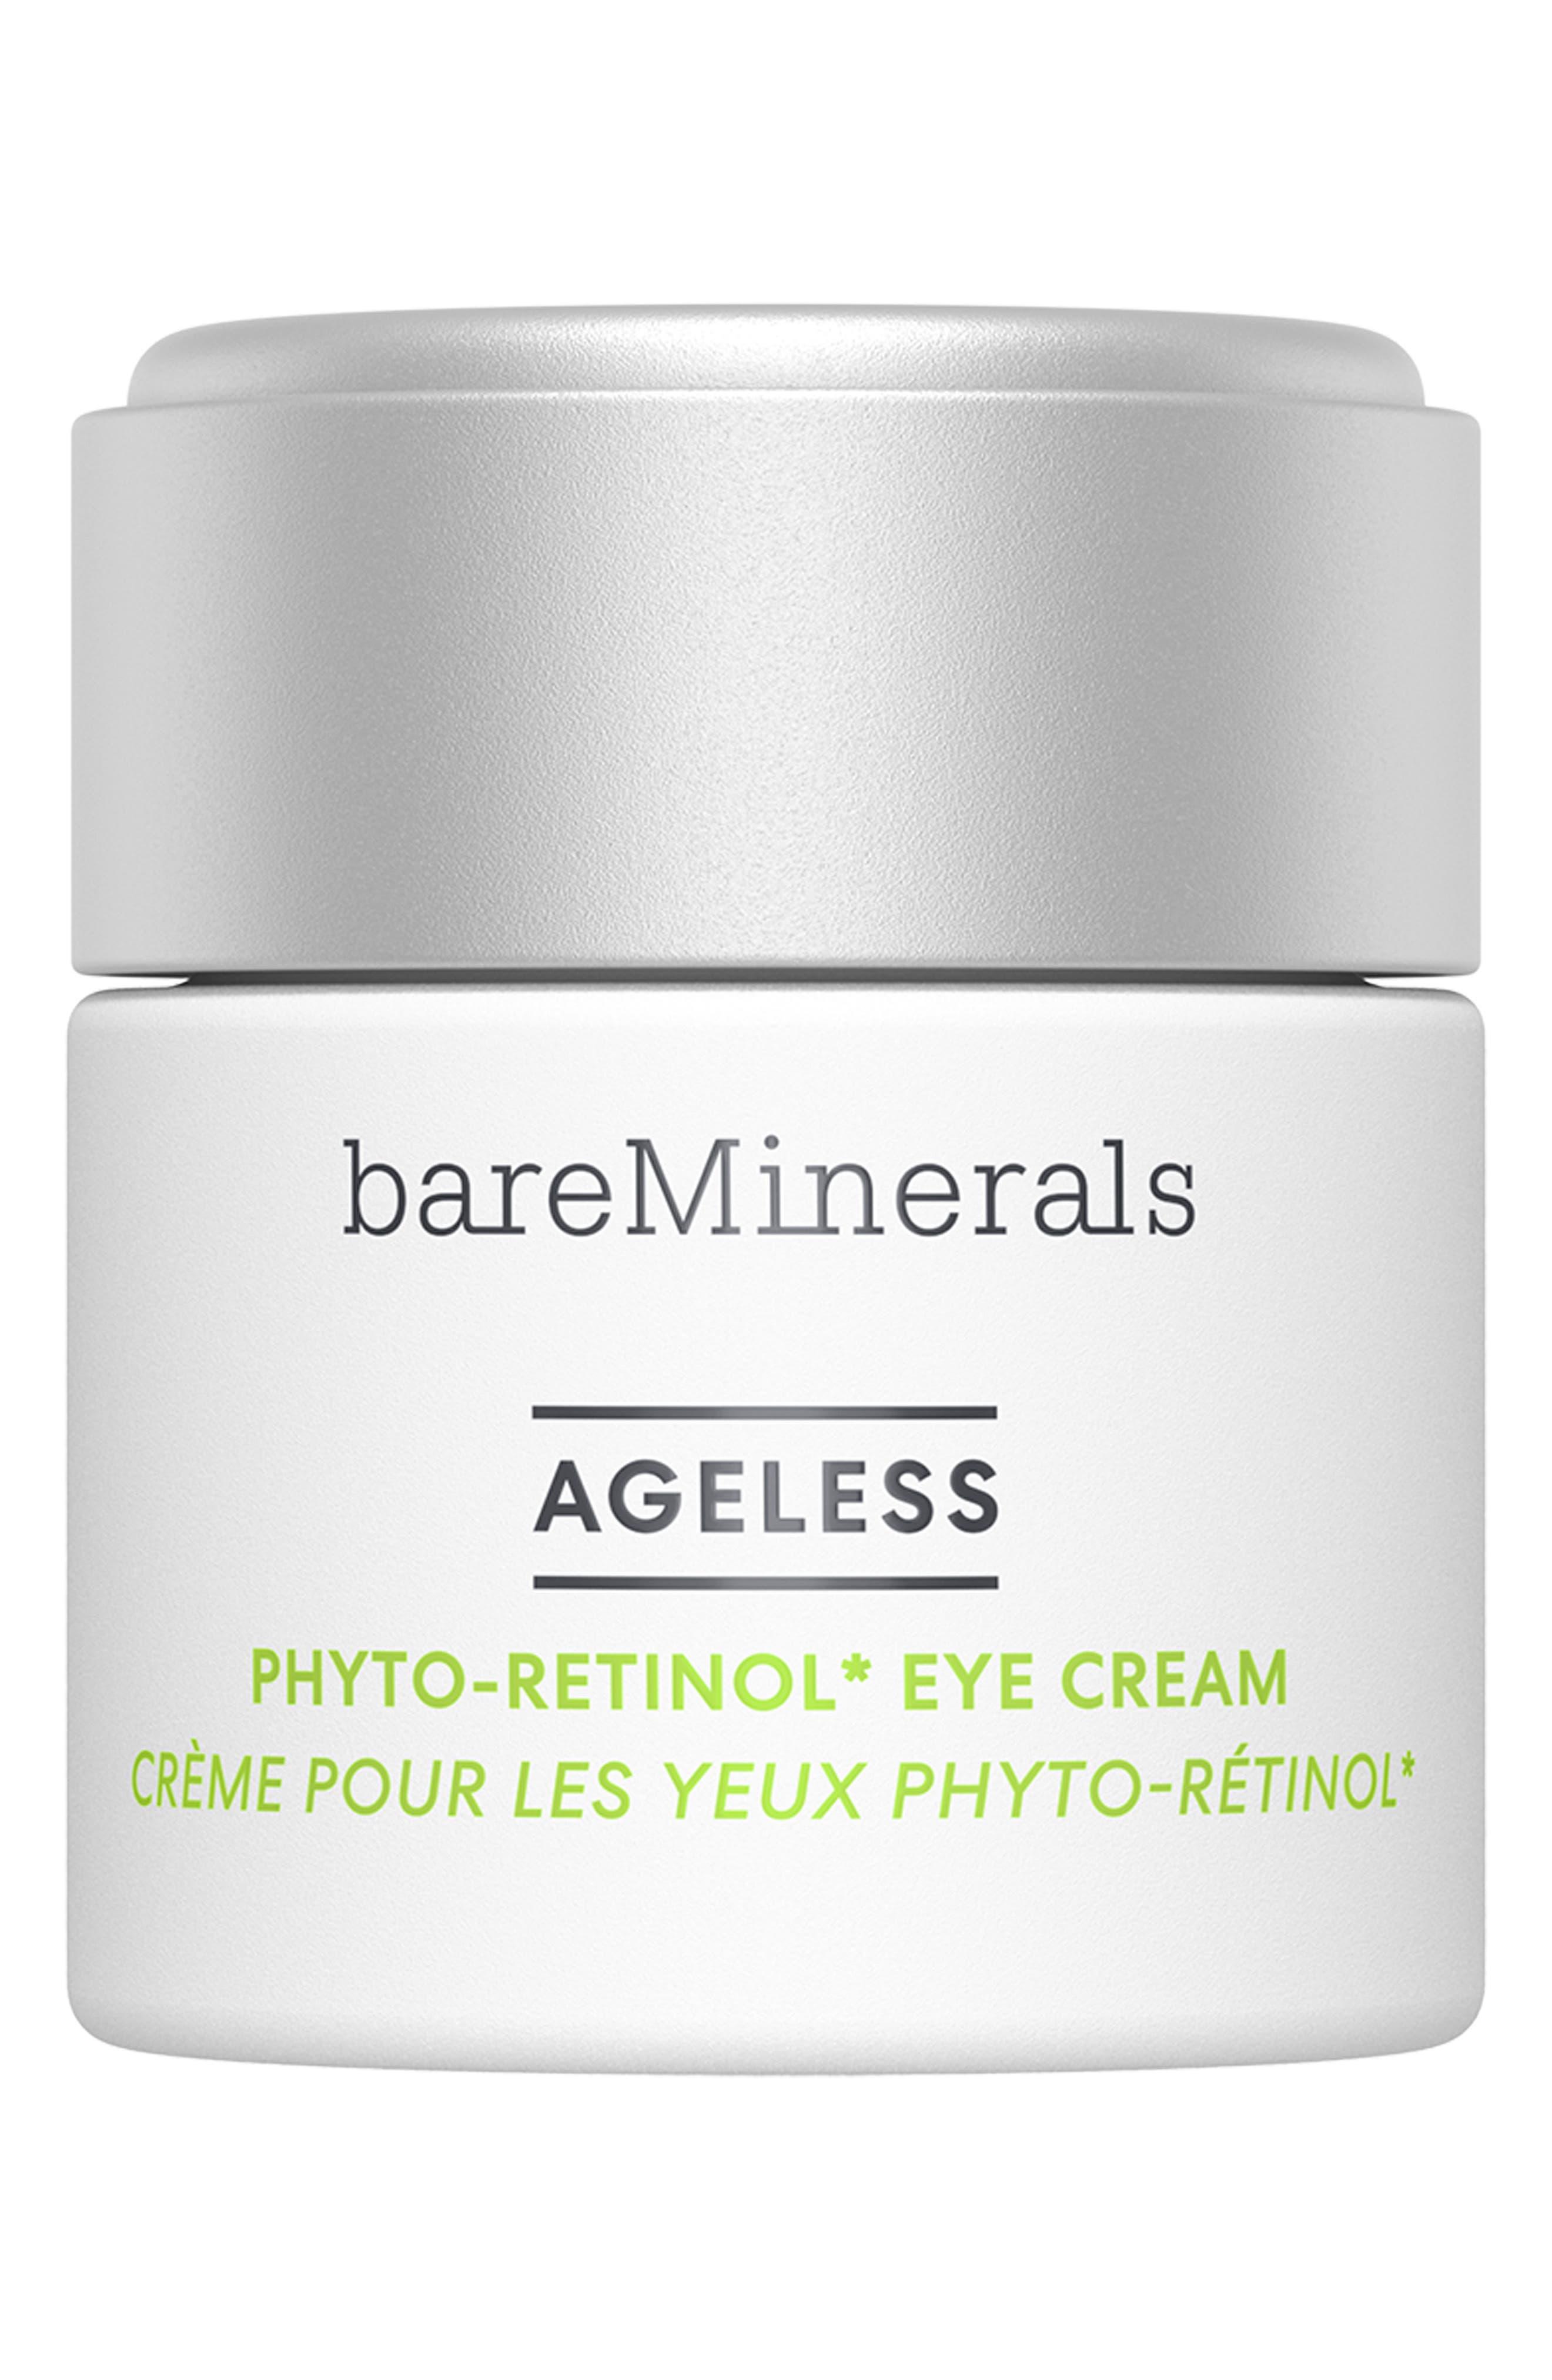 Ageless Phyto-Retinol Eye Cream | Nordstrom